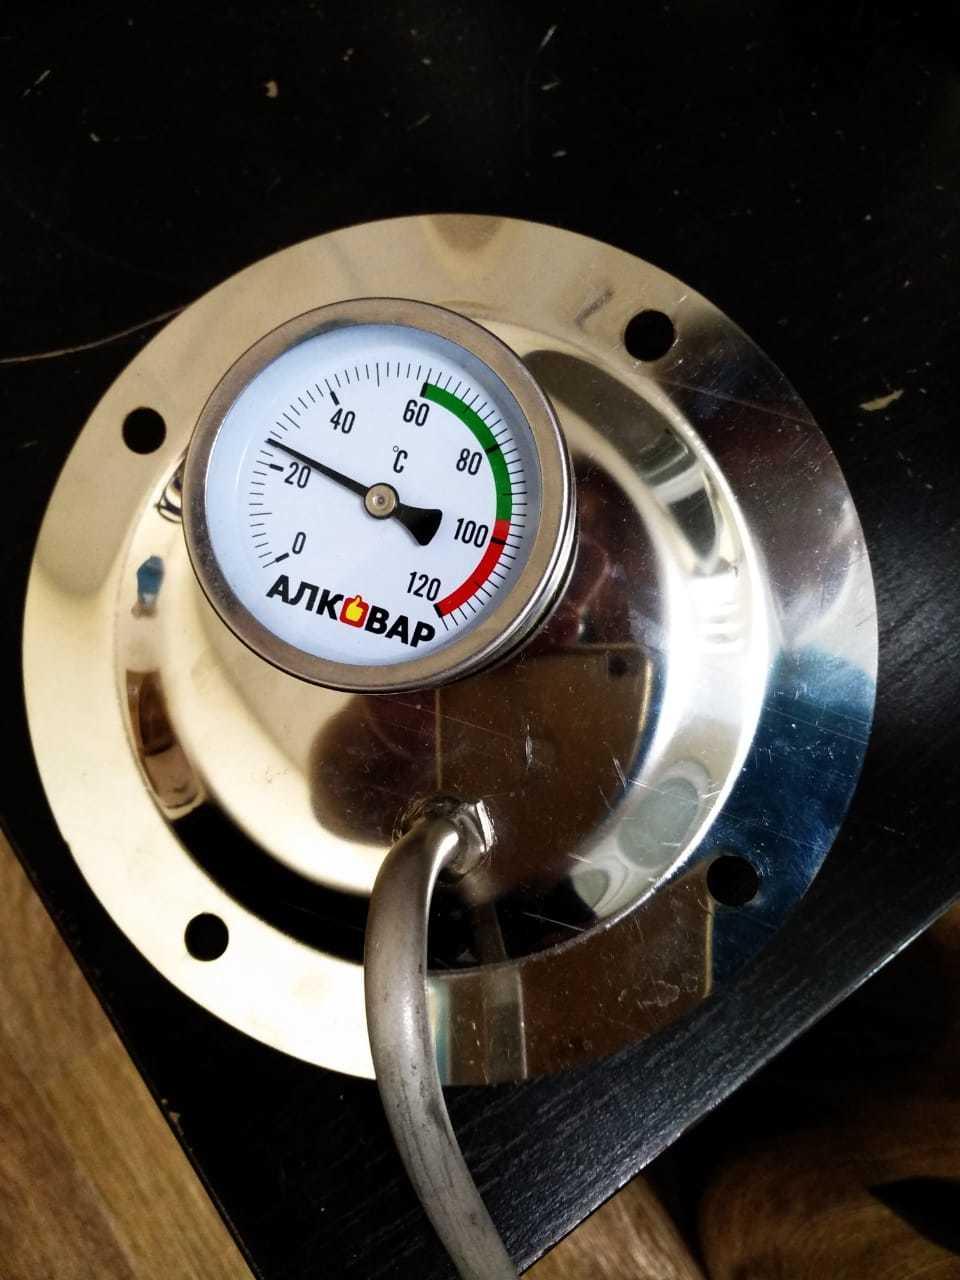 Термометр для самогонного аппарата, зачем он нужен